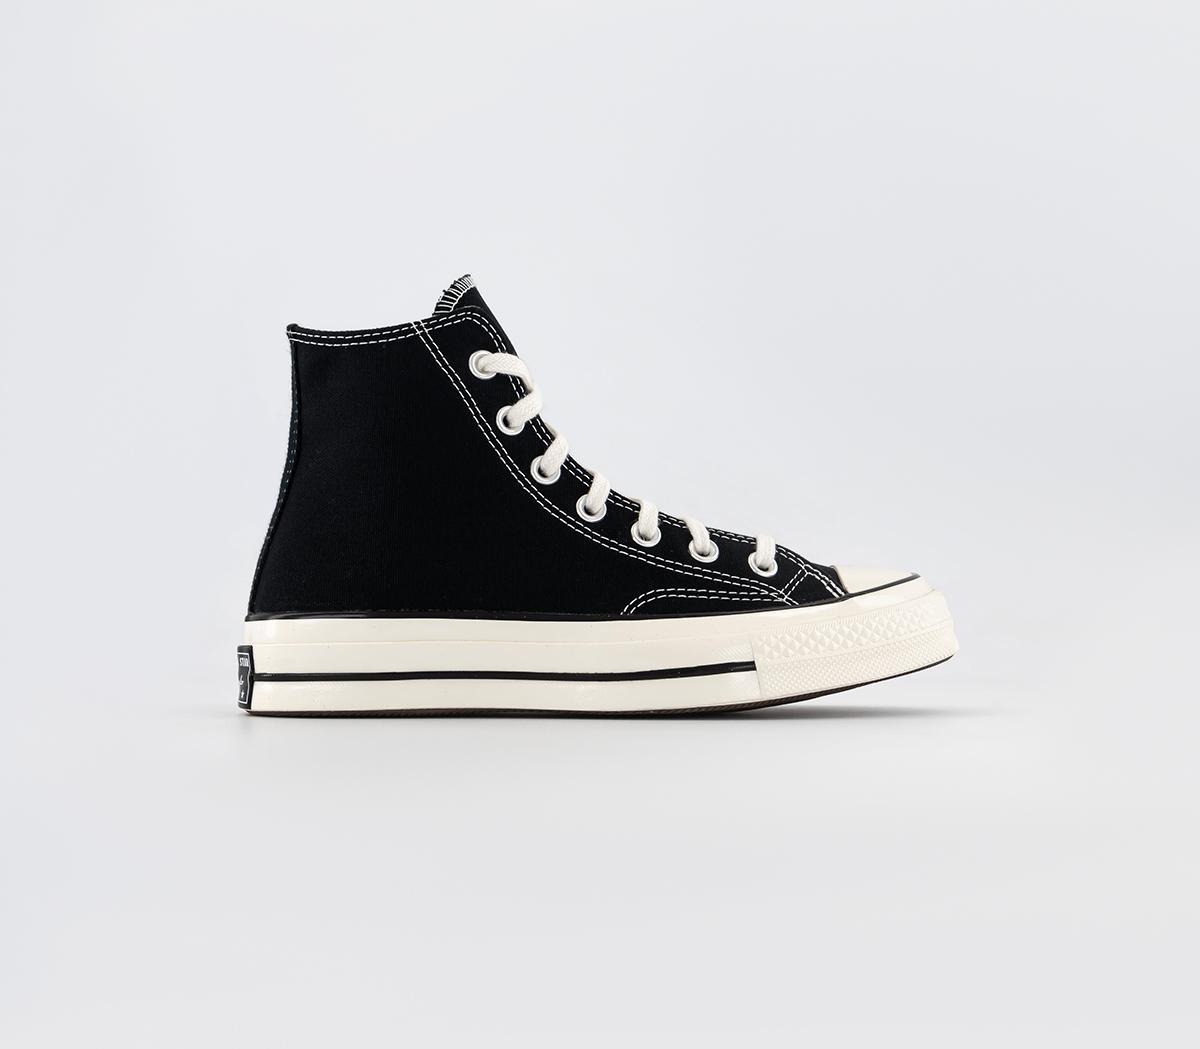 salto Comprimir policía  Converse All Star Hi 70's Black - His trainers